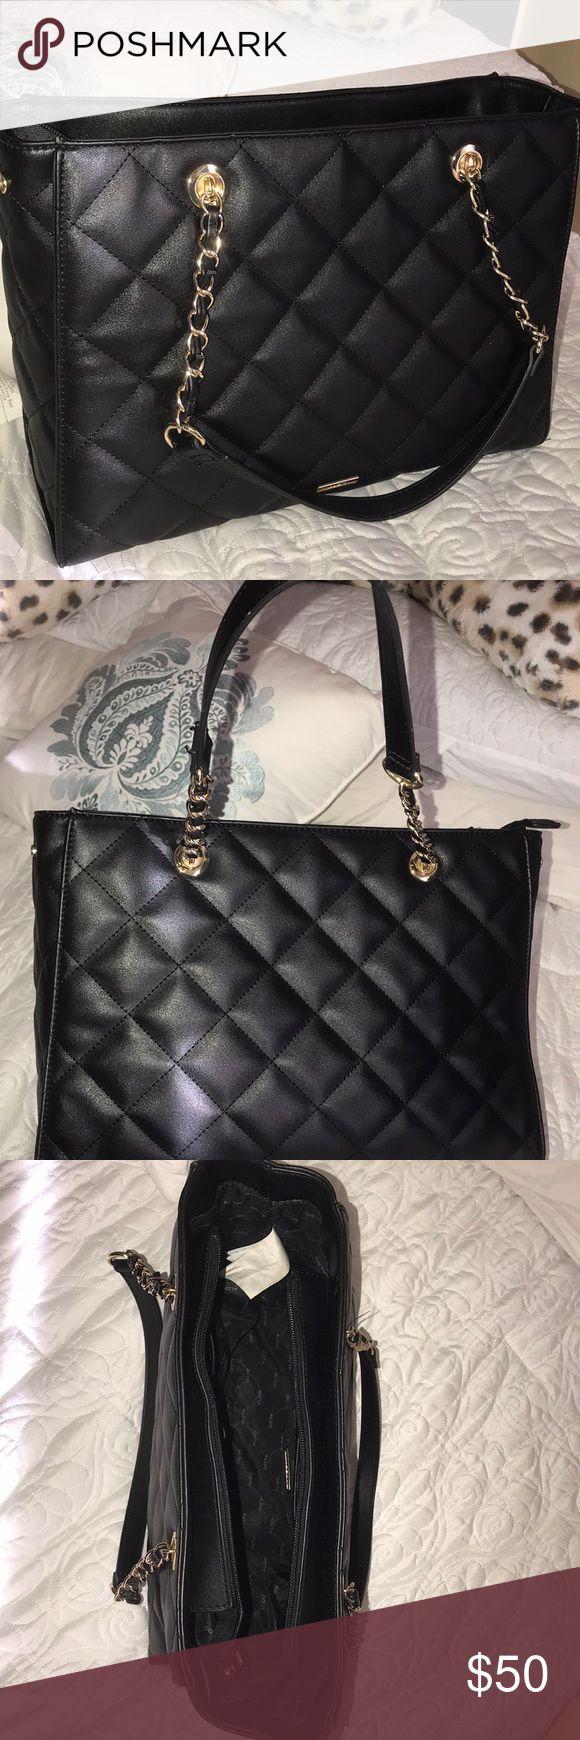 ALDO Tote Bag Black quilted tote medium bag Aldo Bags Shoulder Bags